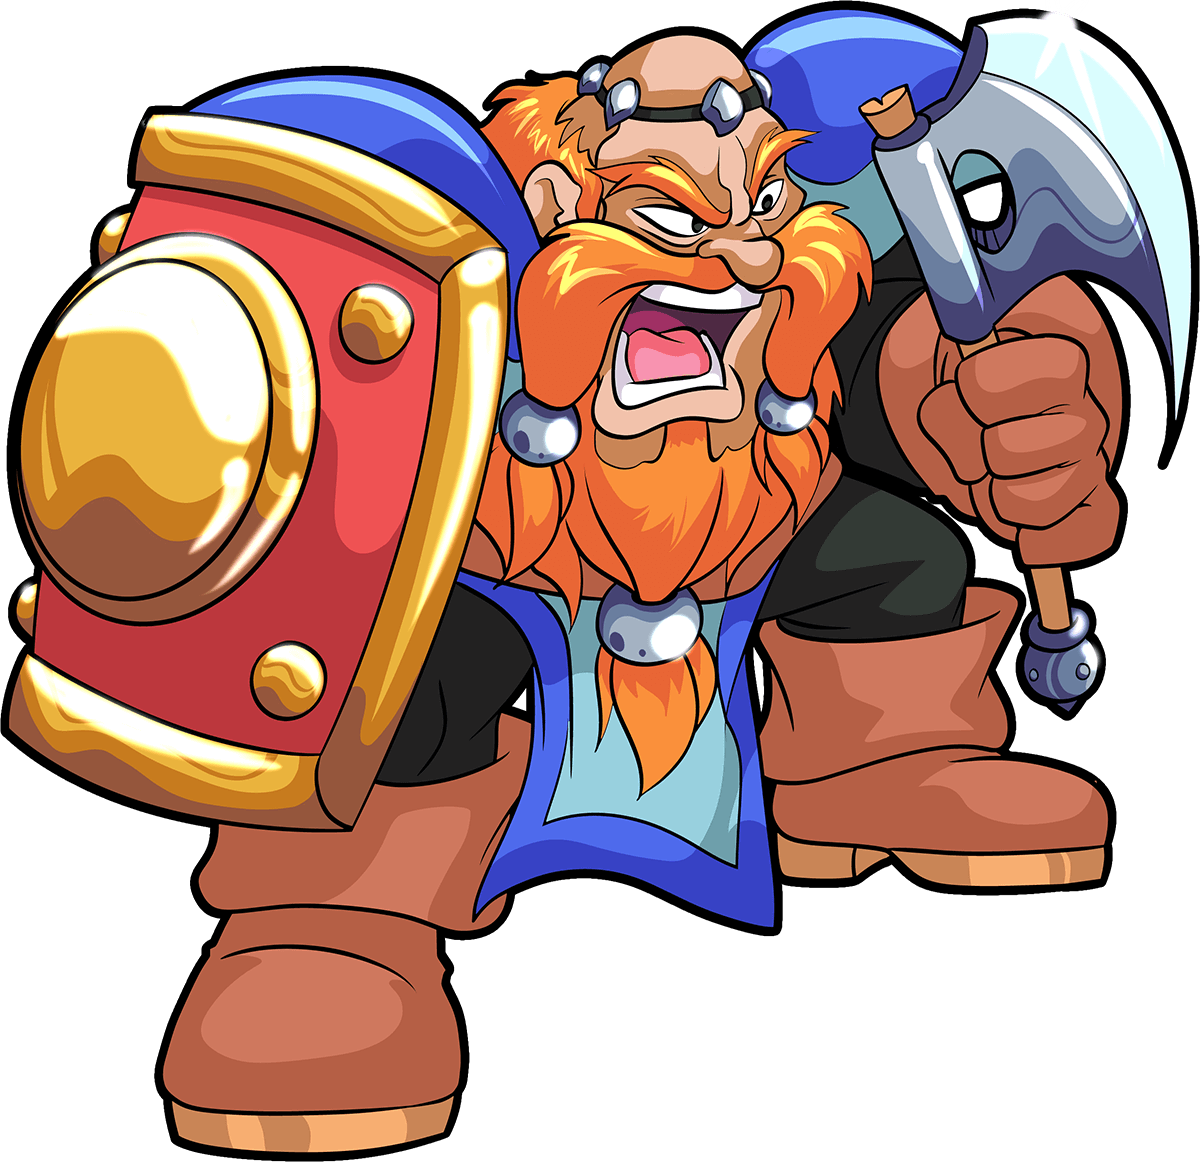 Grumpy Dwarf.png